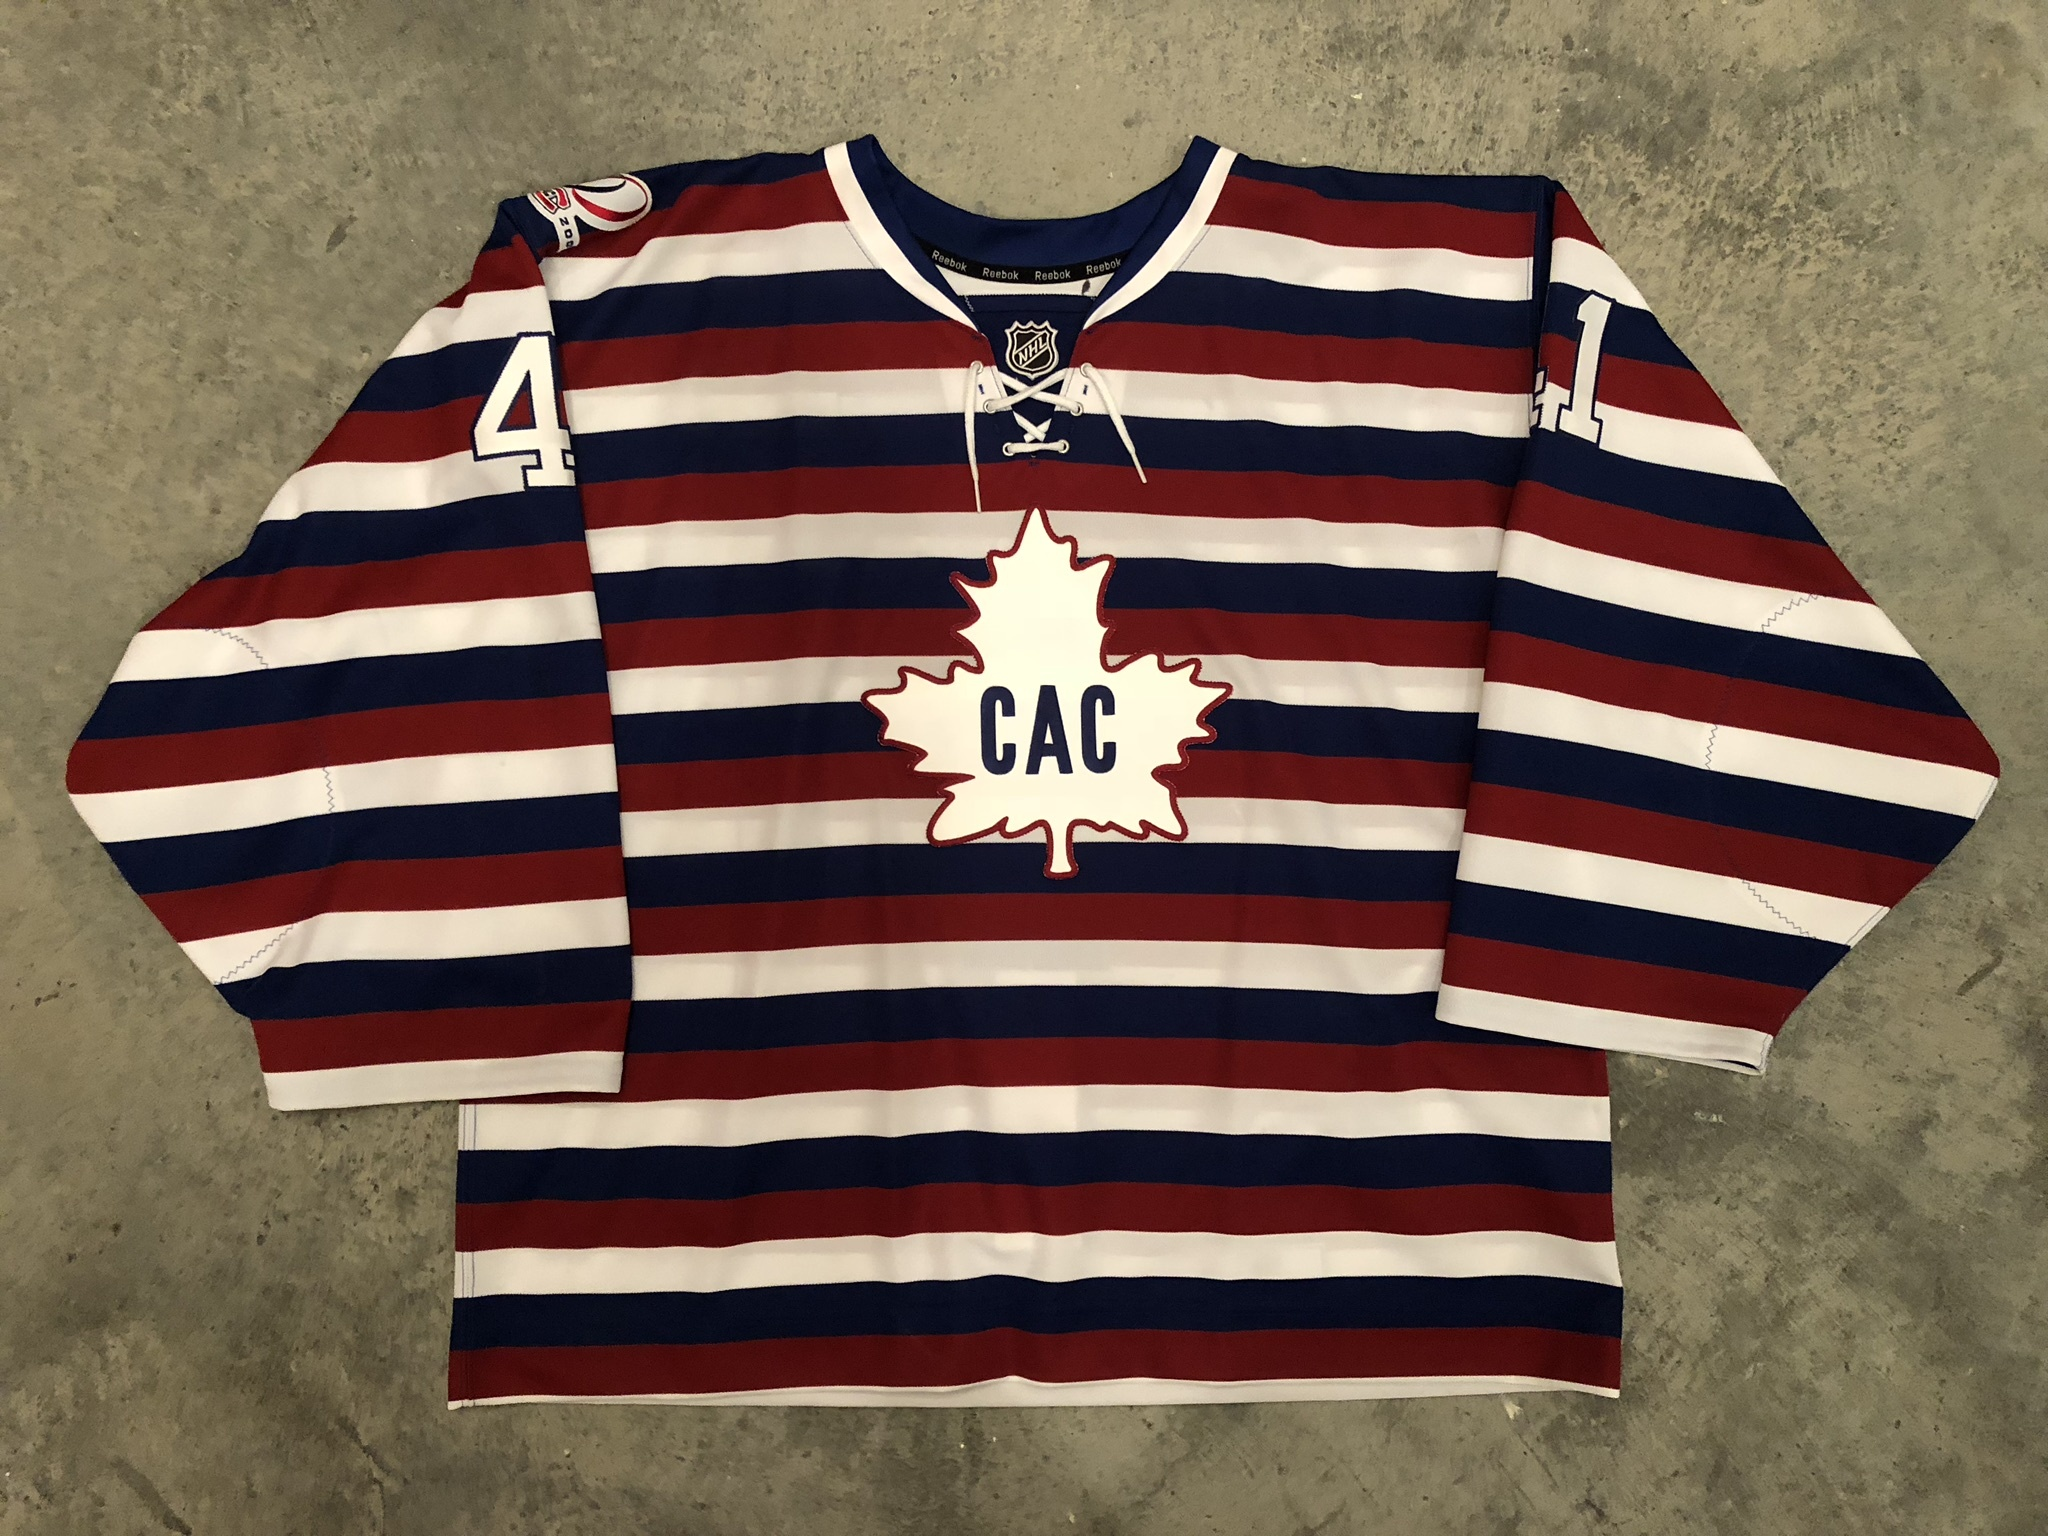 2008-09 Jaroslav Halak Montreal Canadiens 1912-13 Centennial Game Worn Jersey